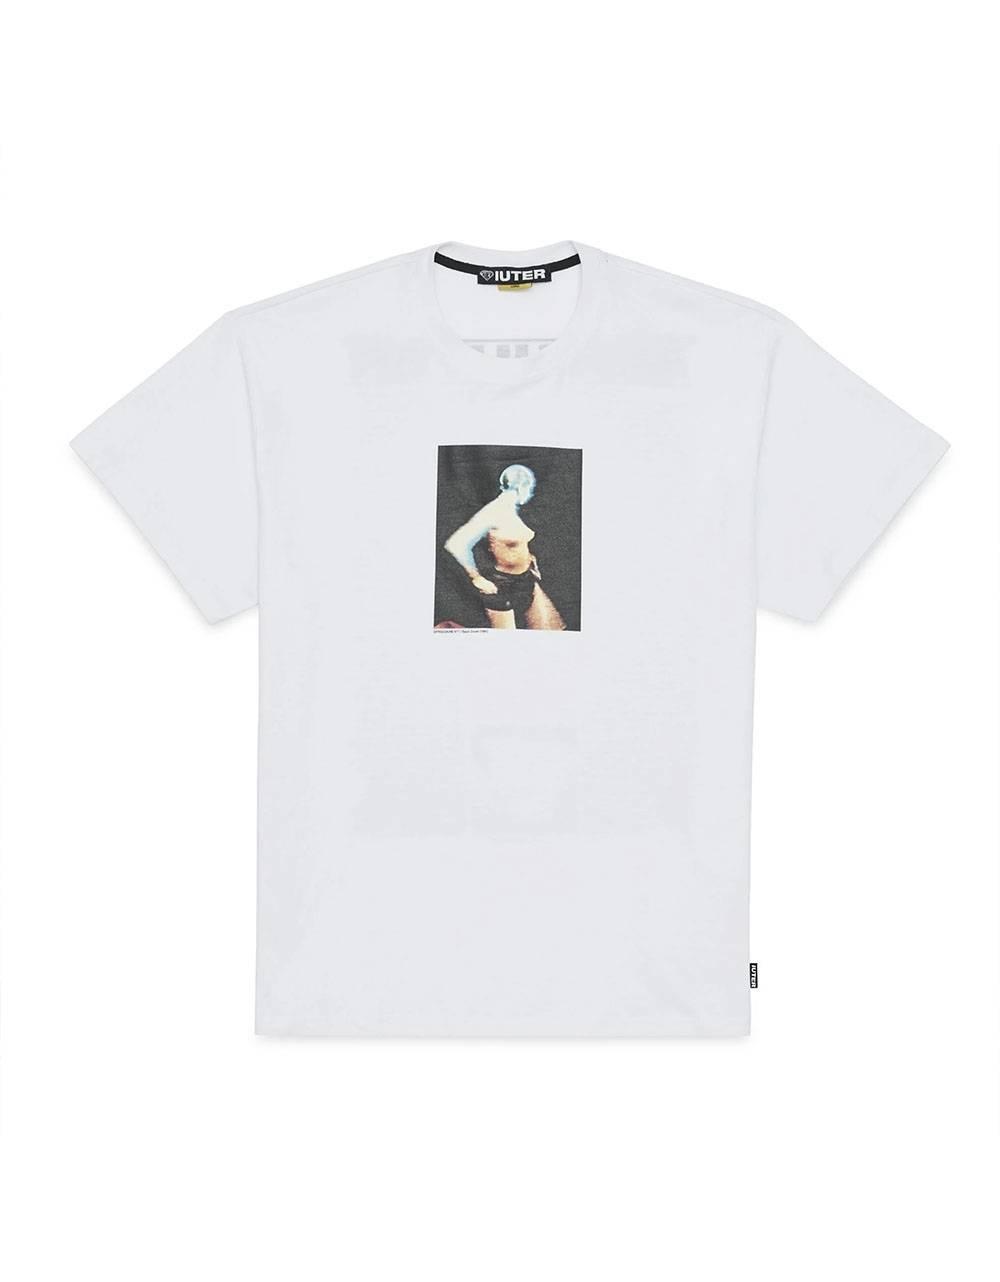 Iuter Frigidaire Pola tee - White IUTER T-shirt 49,18€